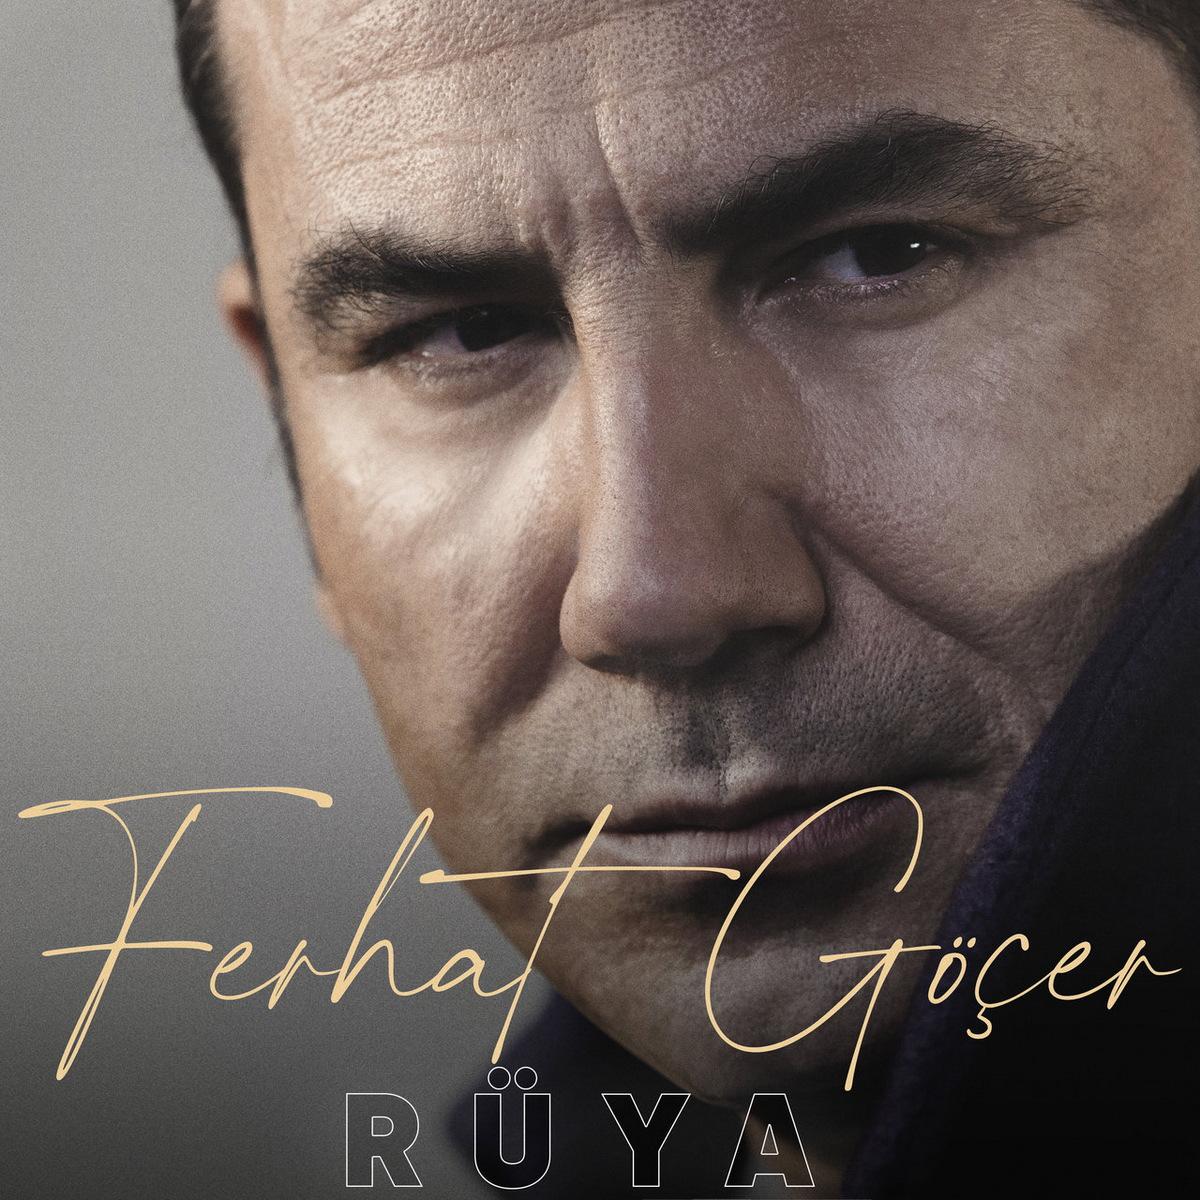 دانلود آلبوم Ferhat Gocer به نام Ruya